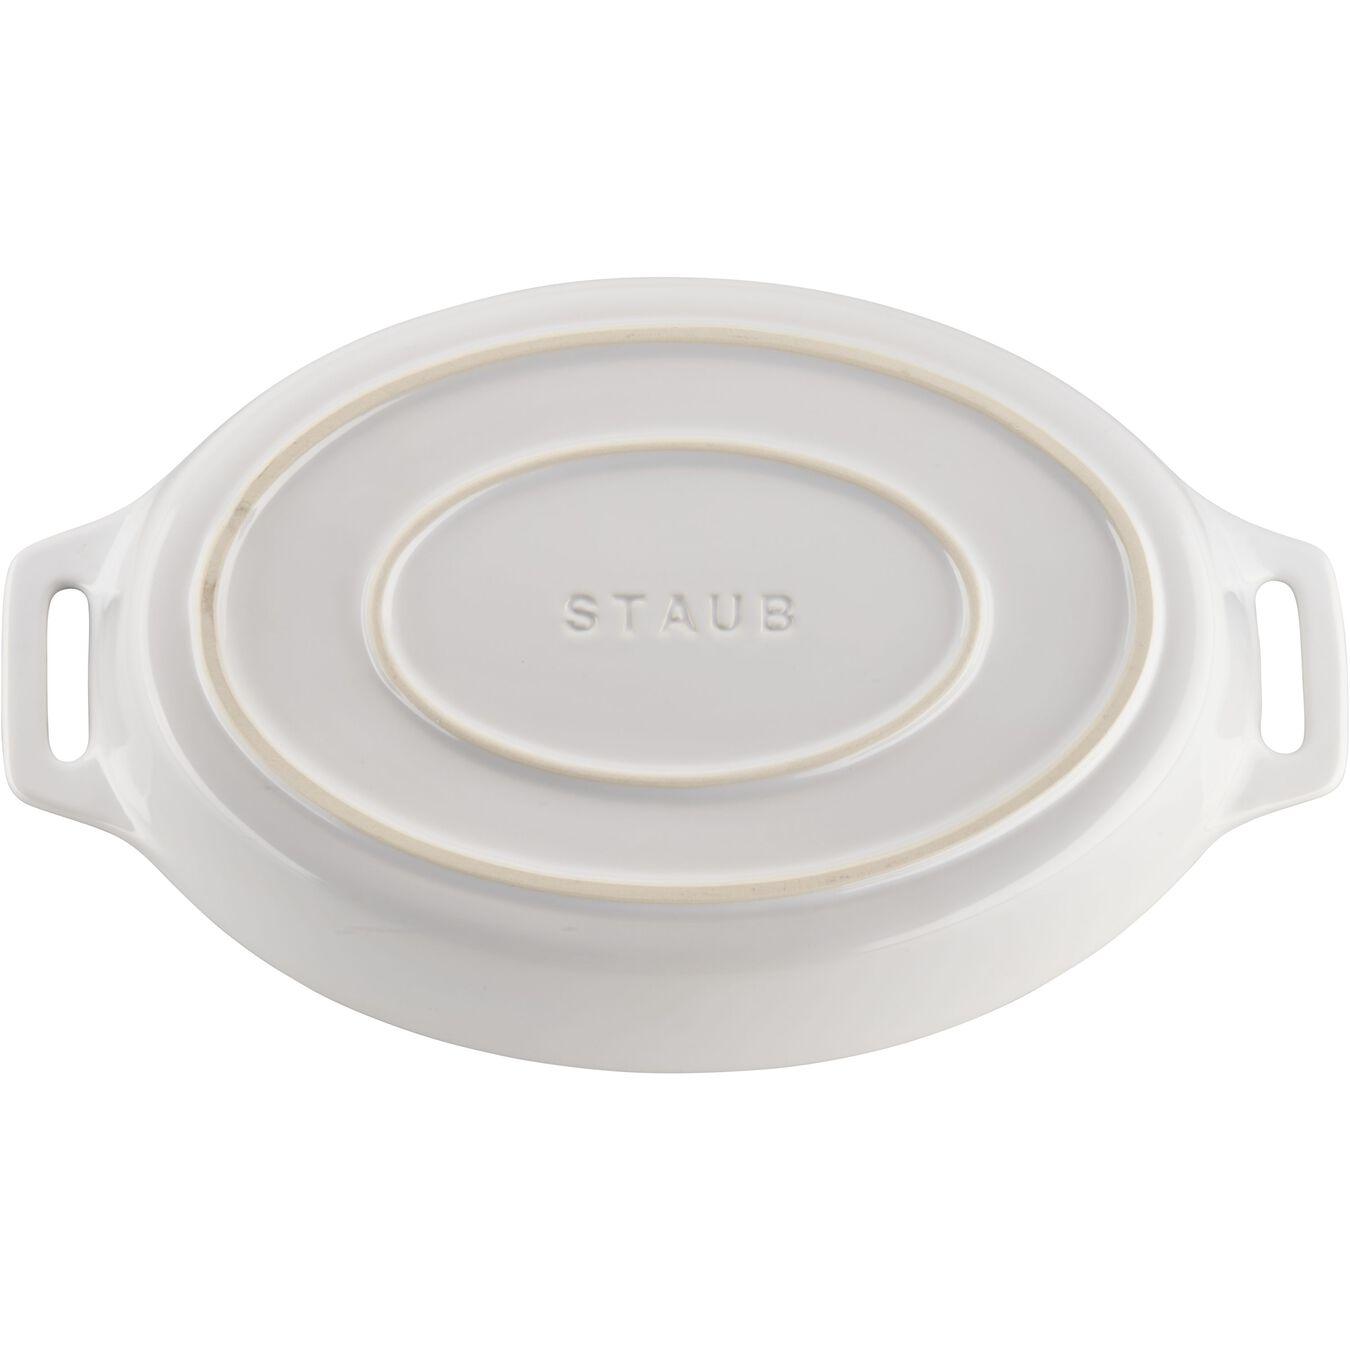 2-pc, oval, Bakeware set, white,,large 5